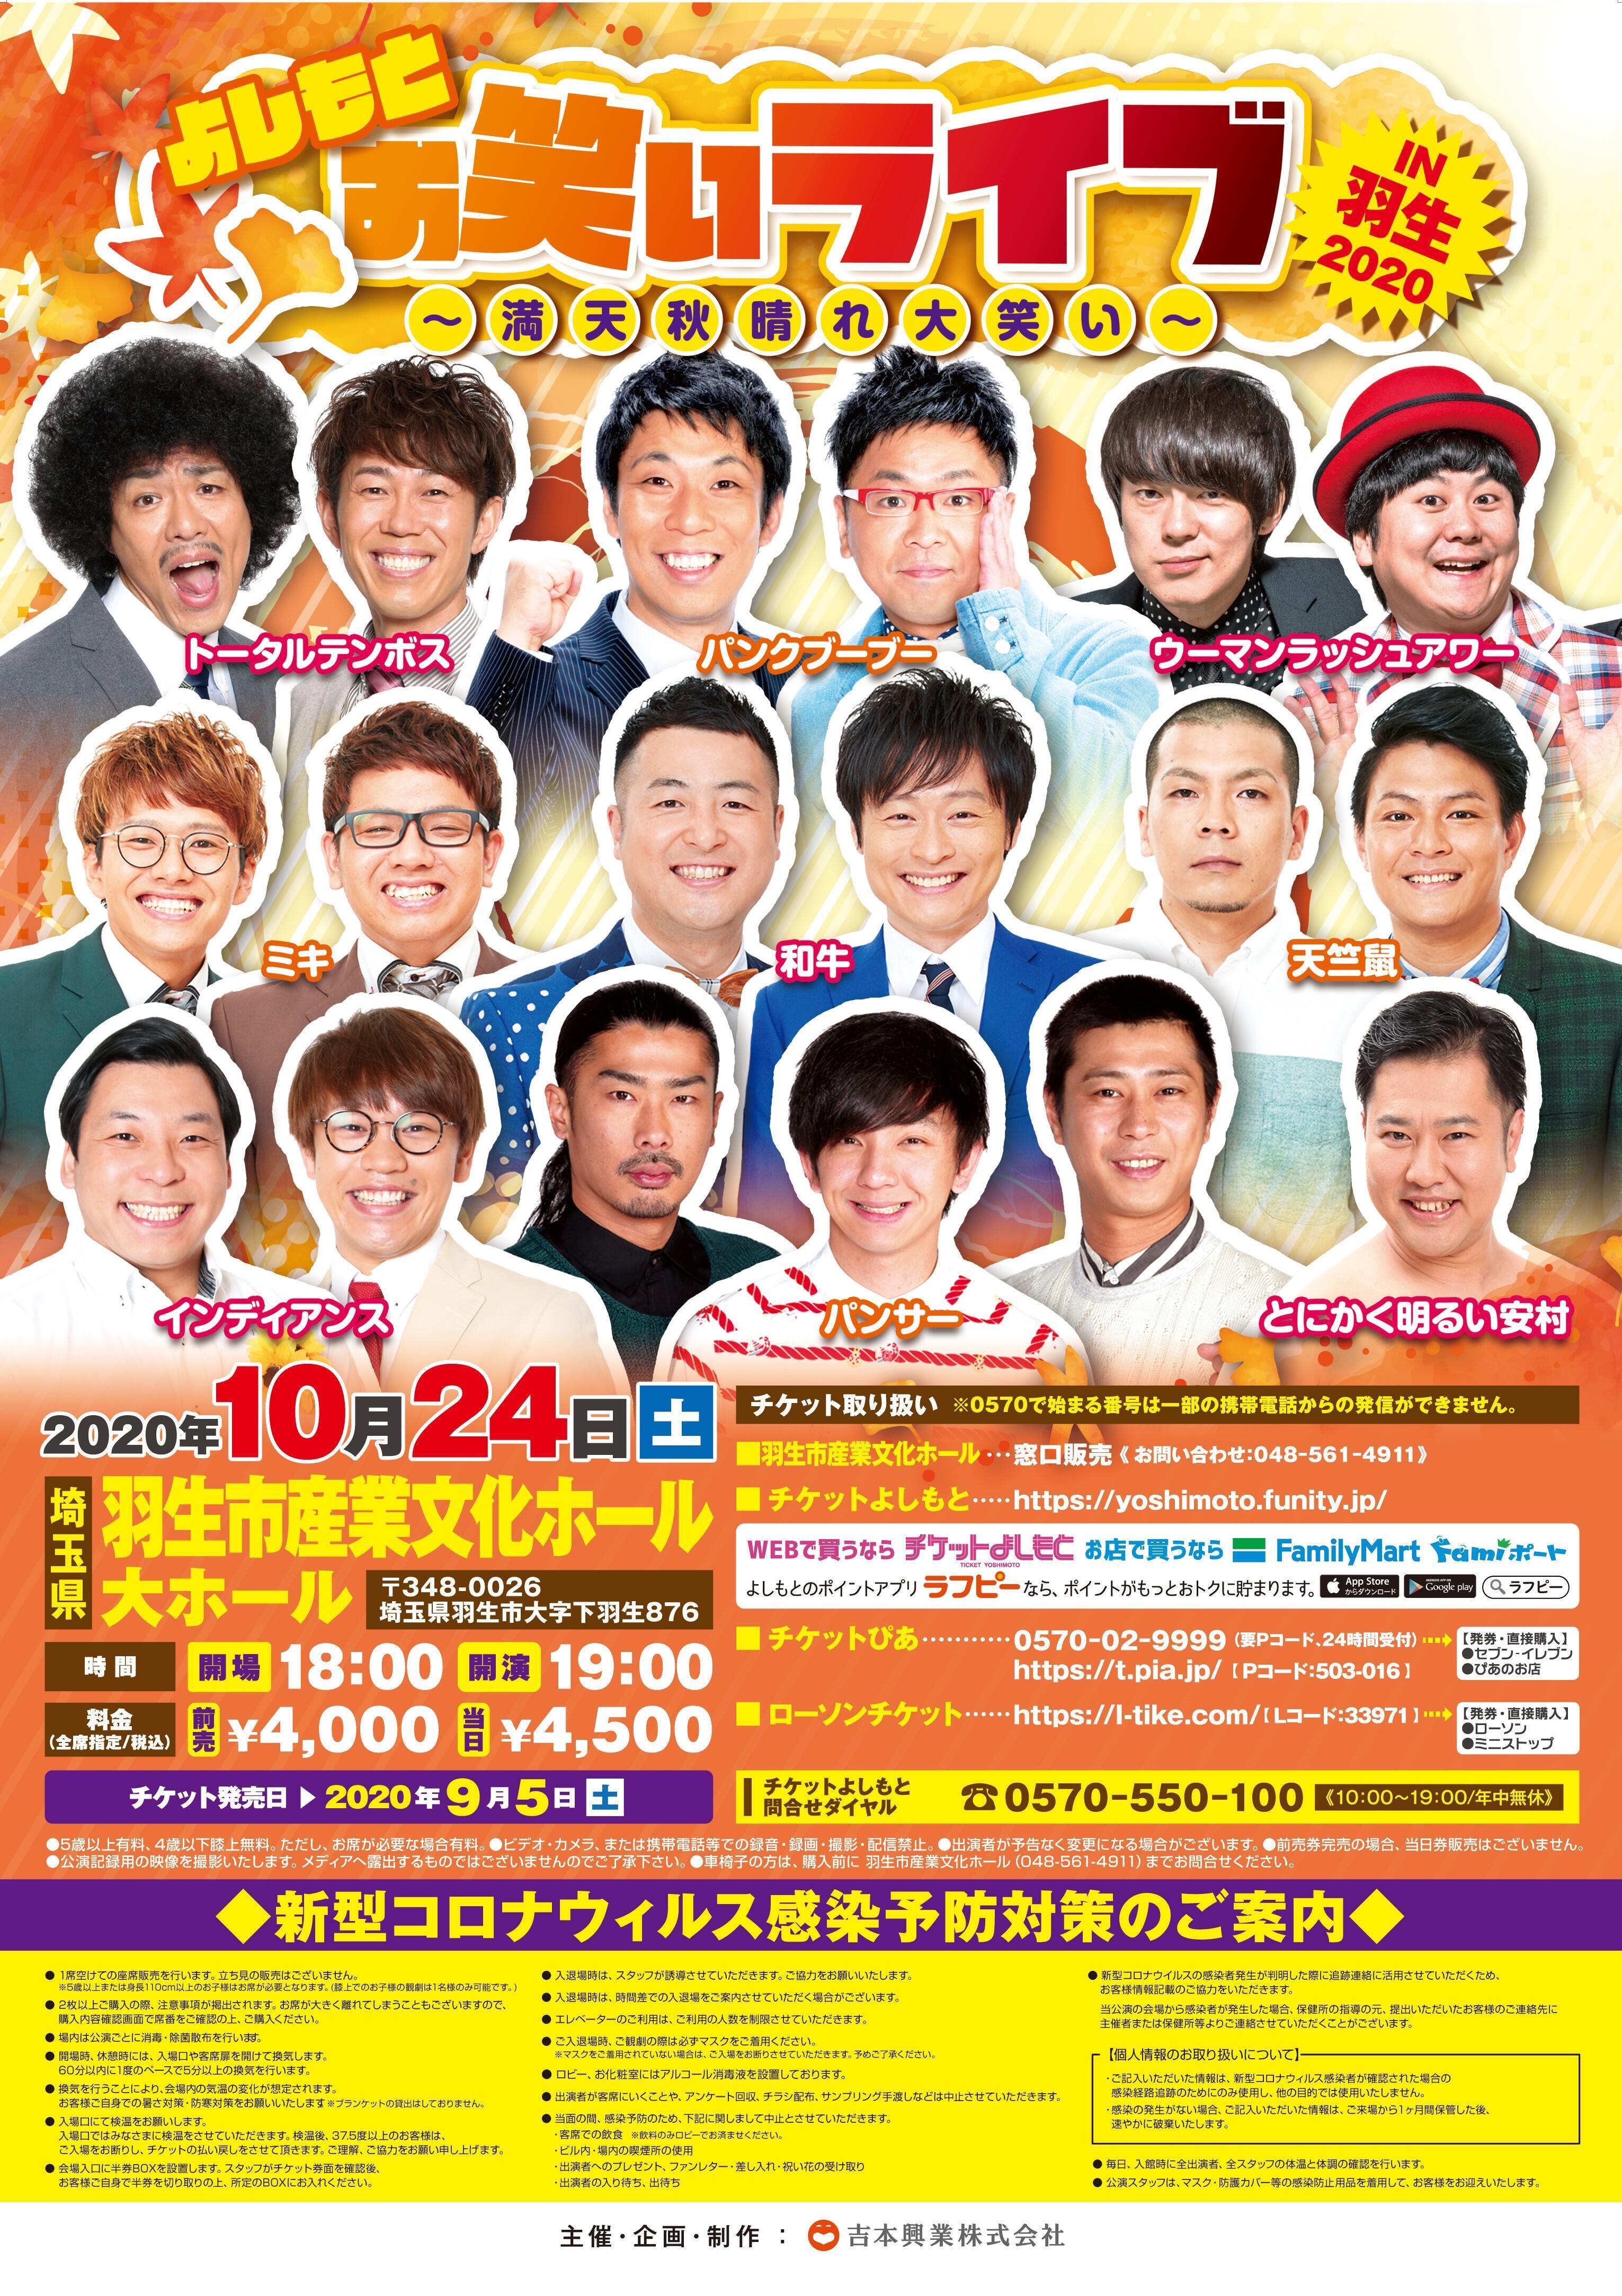 http://www.syumatsu.jp/20200831172618-843bcf4bdf42561d4b4caface7c7077d2292d216.jpg